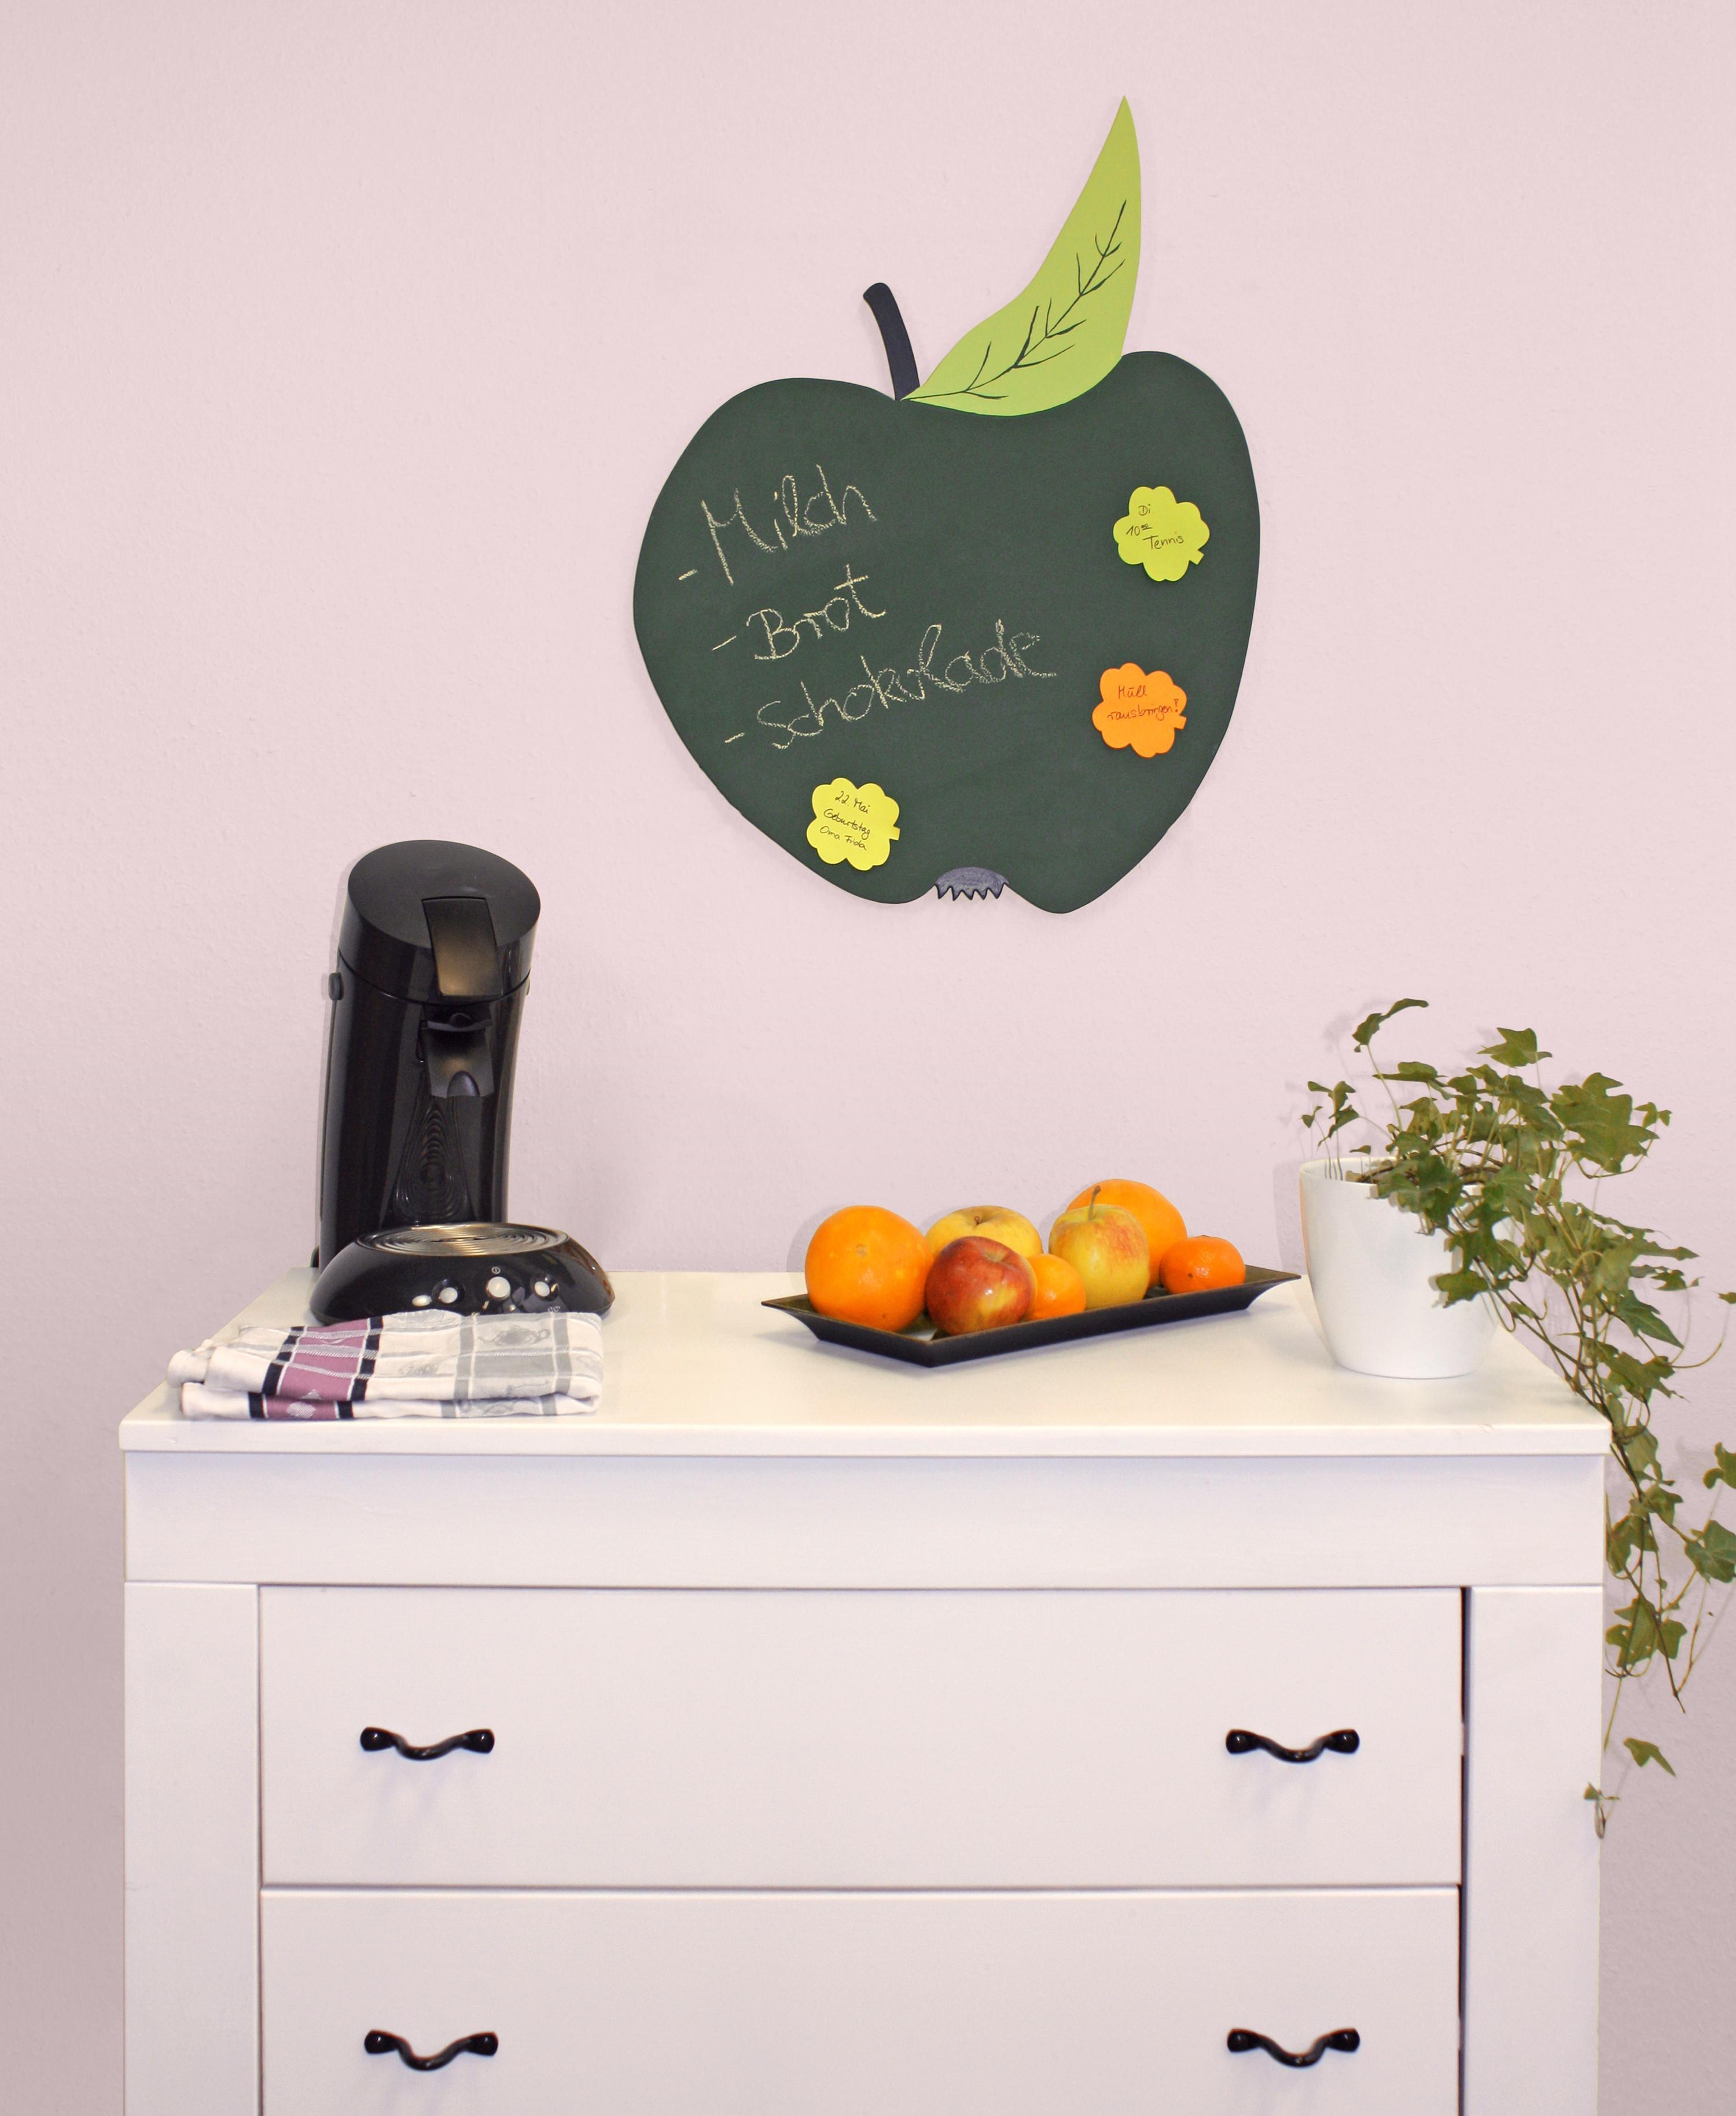 Apfel Tafel Kueche